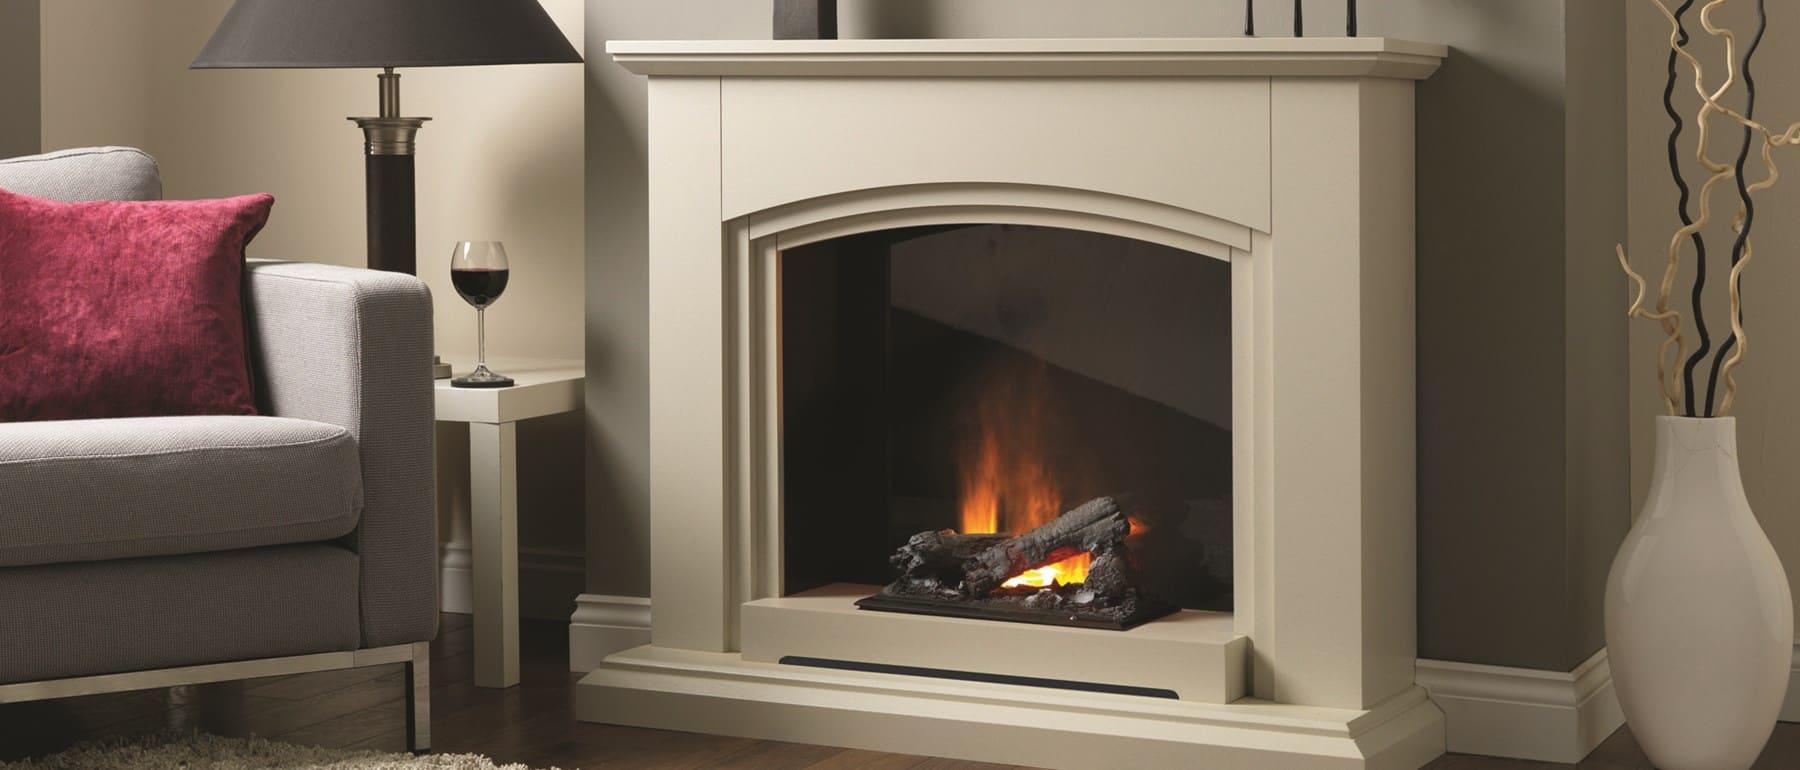 Italia Siena Optimyst Electric Fireplace Suite Sandstone Effect